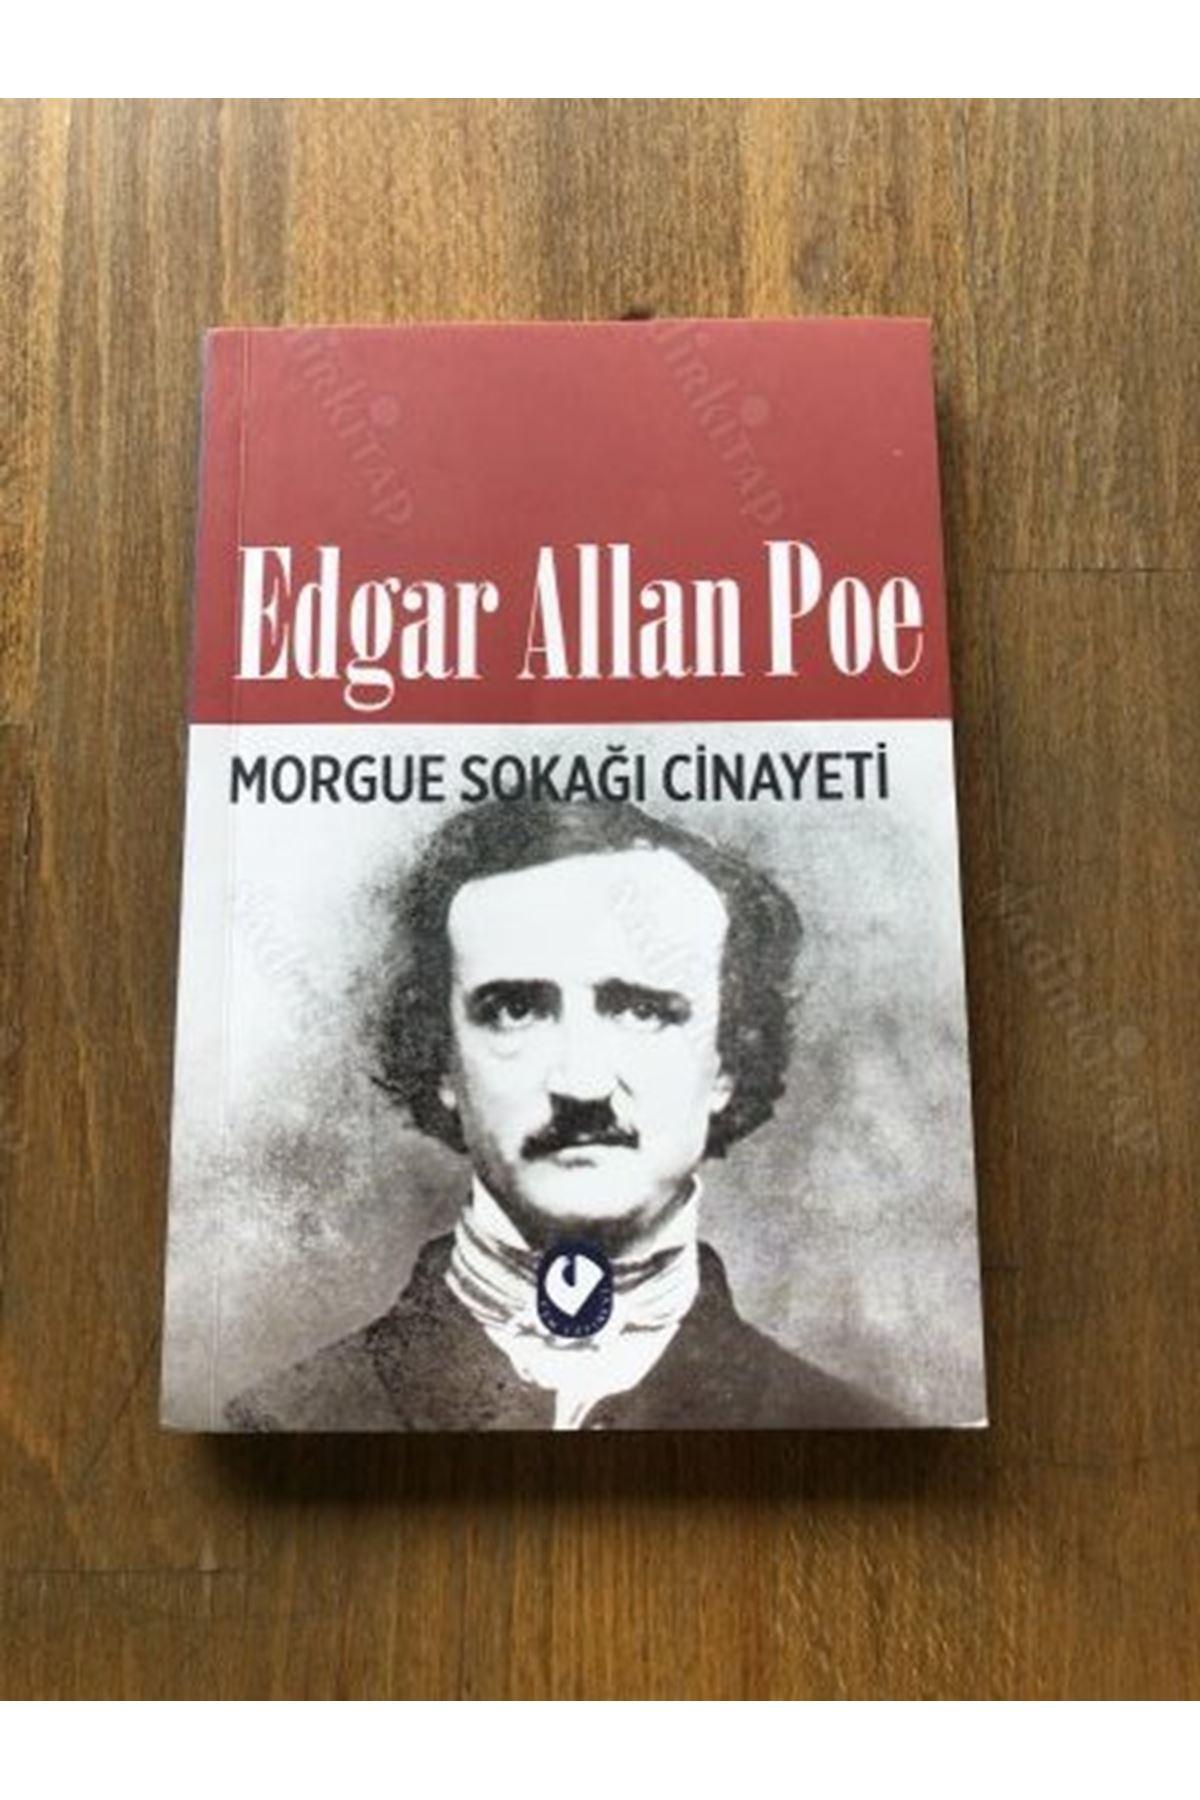 EDGAR ALLAN POE - MORGUE SOKAĞI CİNAYETİ